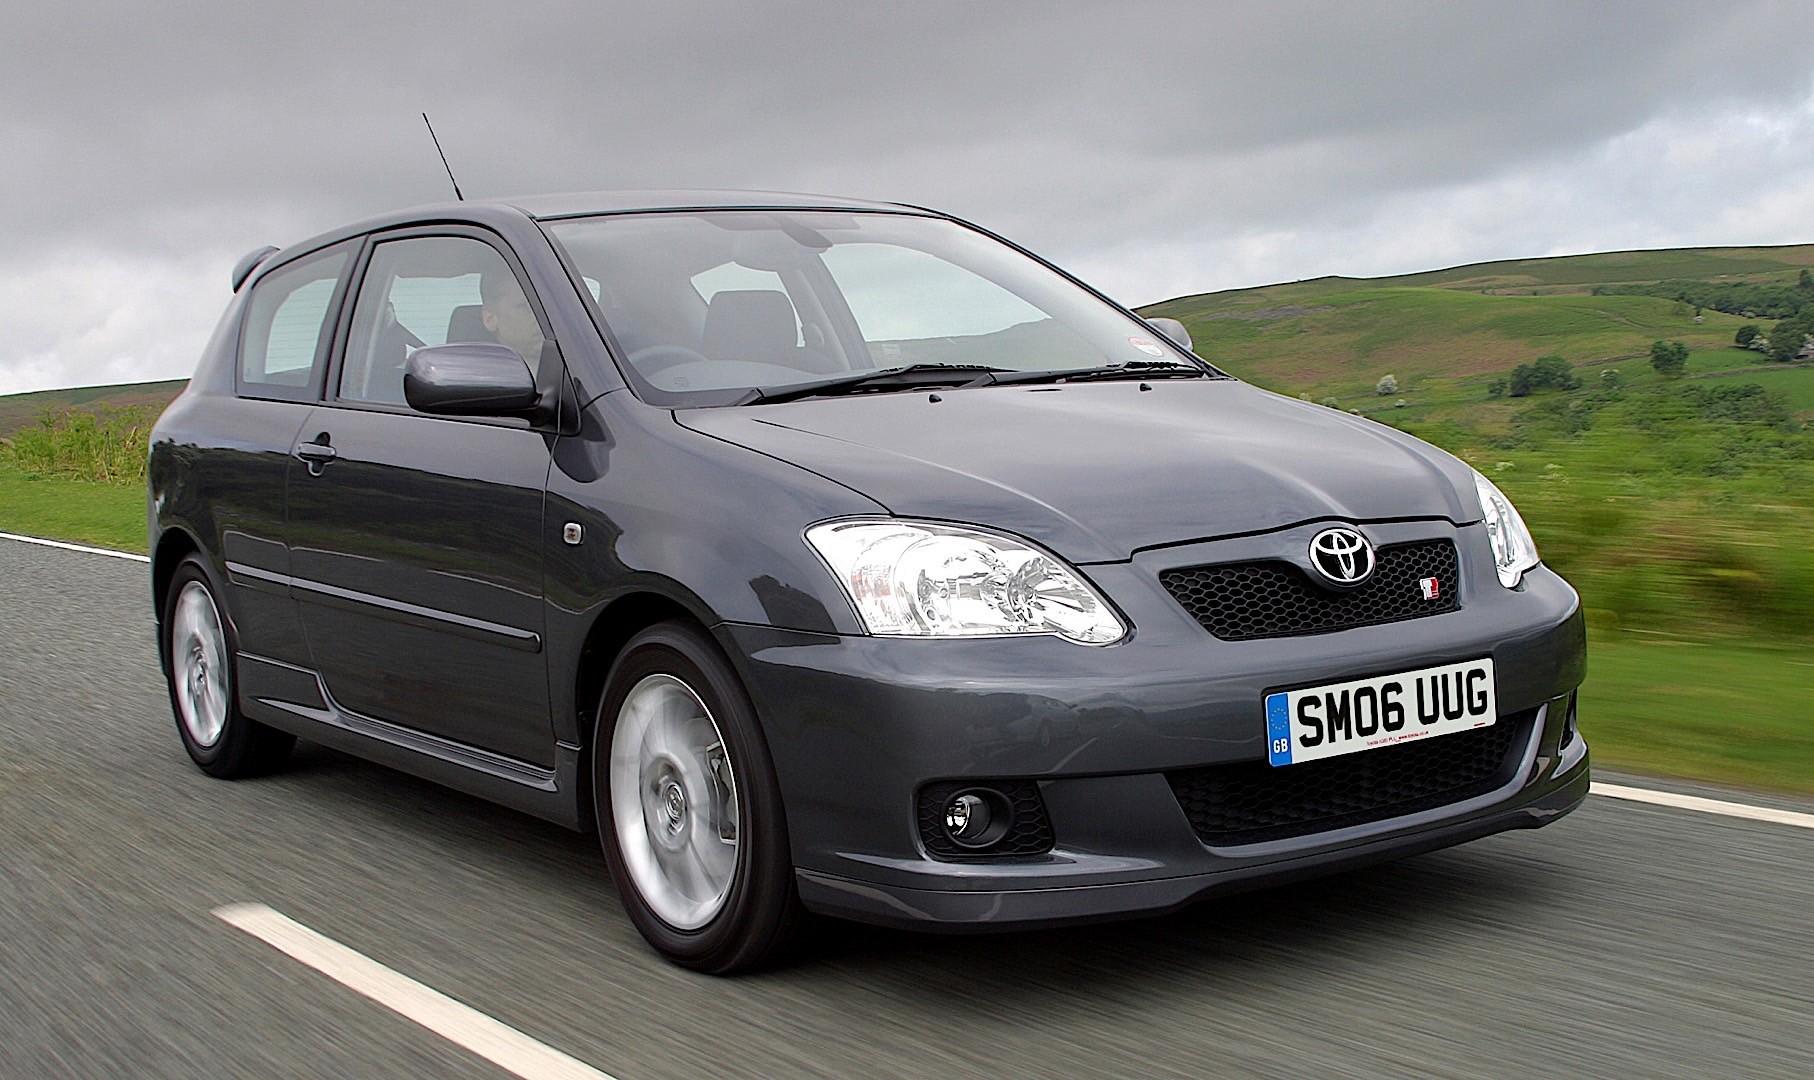 Toyota Corolla Model 2005 >> TOYOTA Corolla 3 Doors specs - 2004, 2005, 2006, 2007 - autoevolution